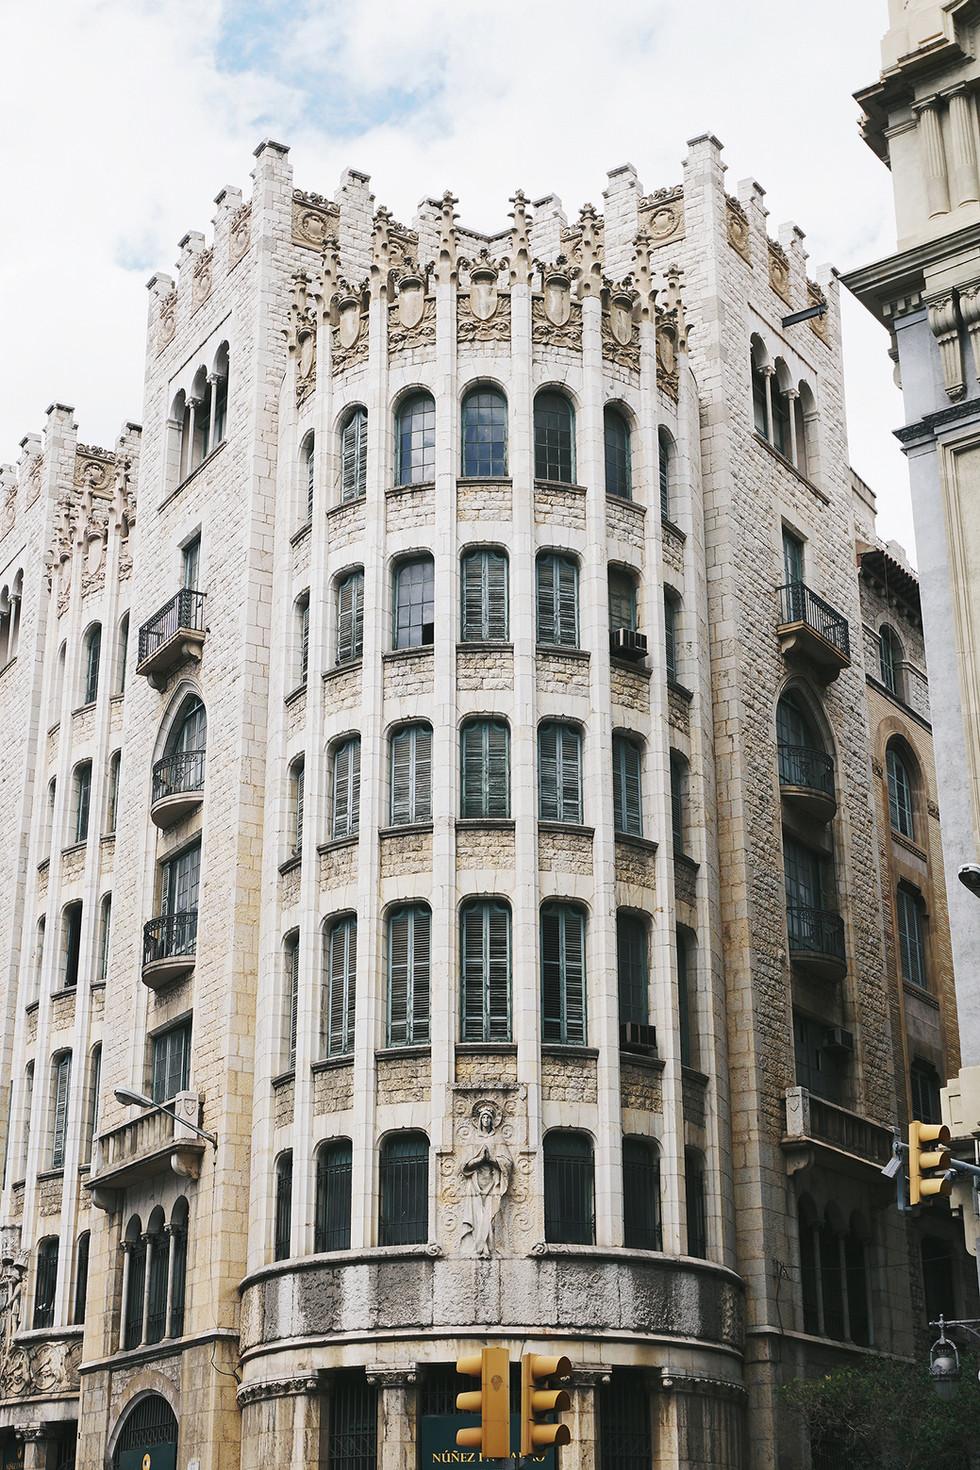 Barcelona-Spain-Building.jpg